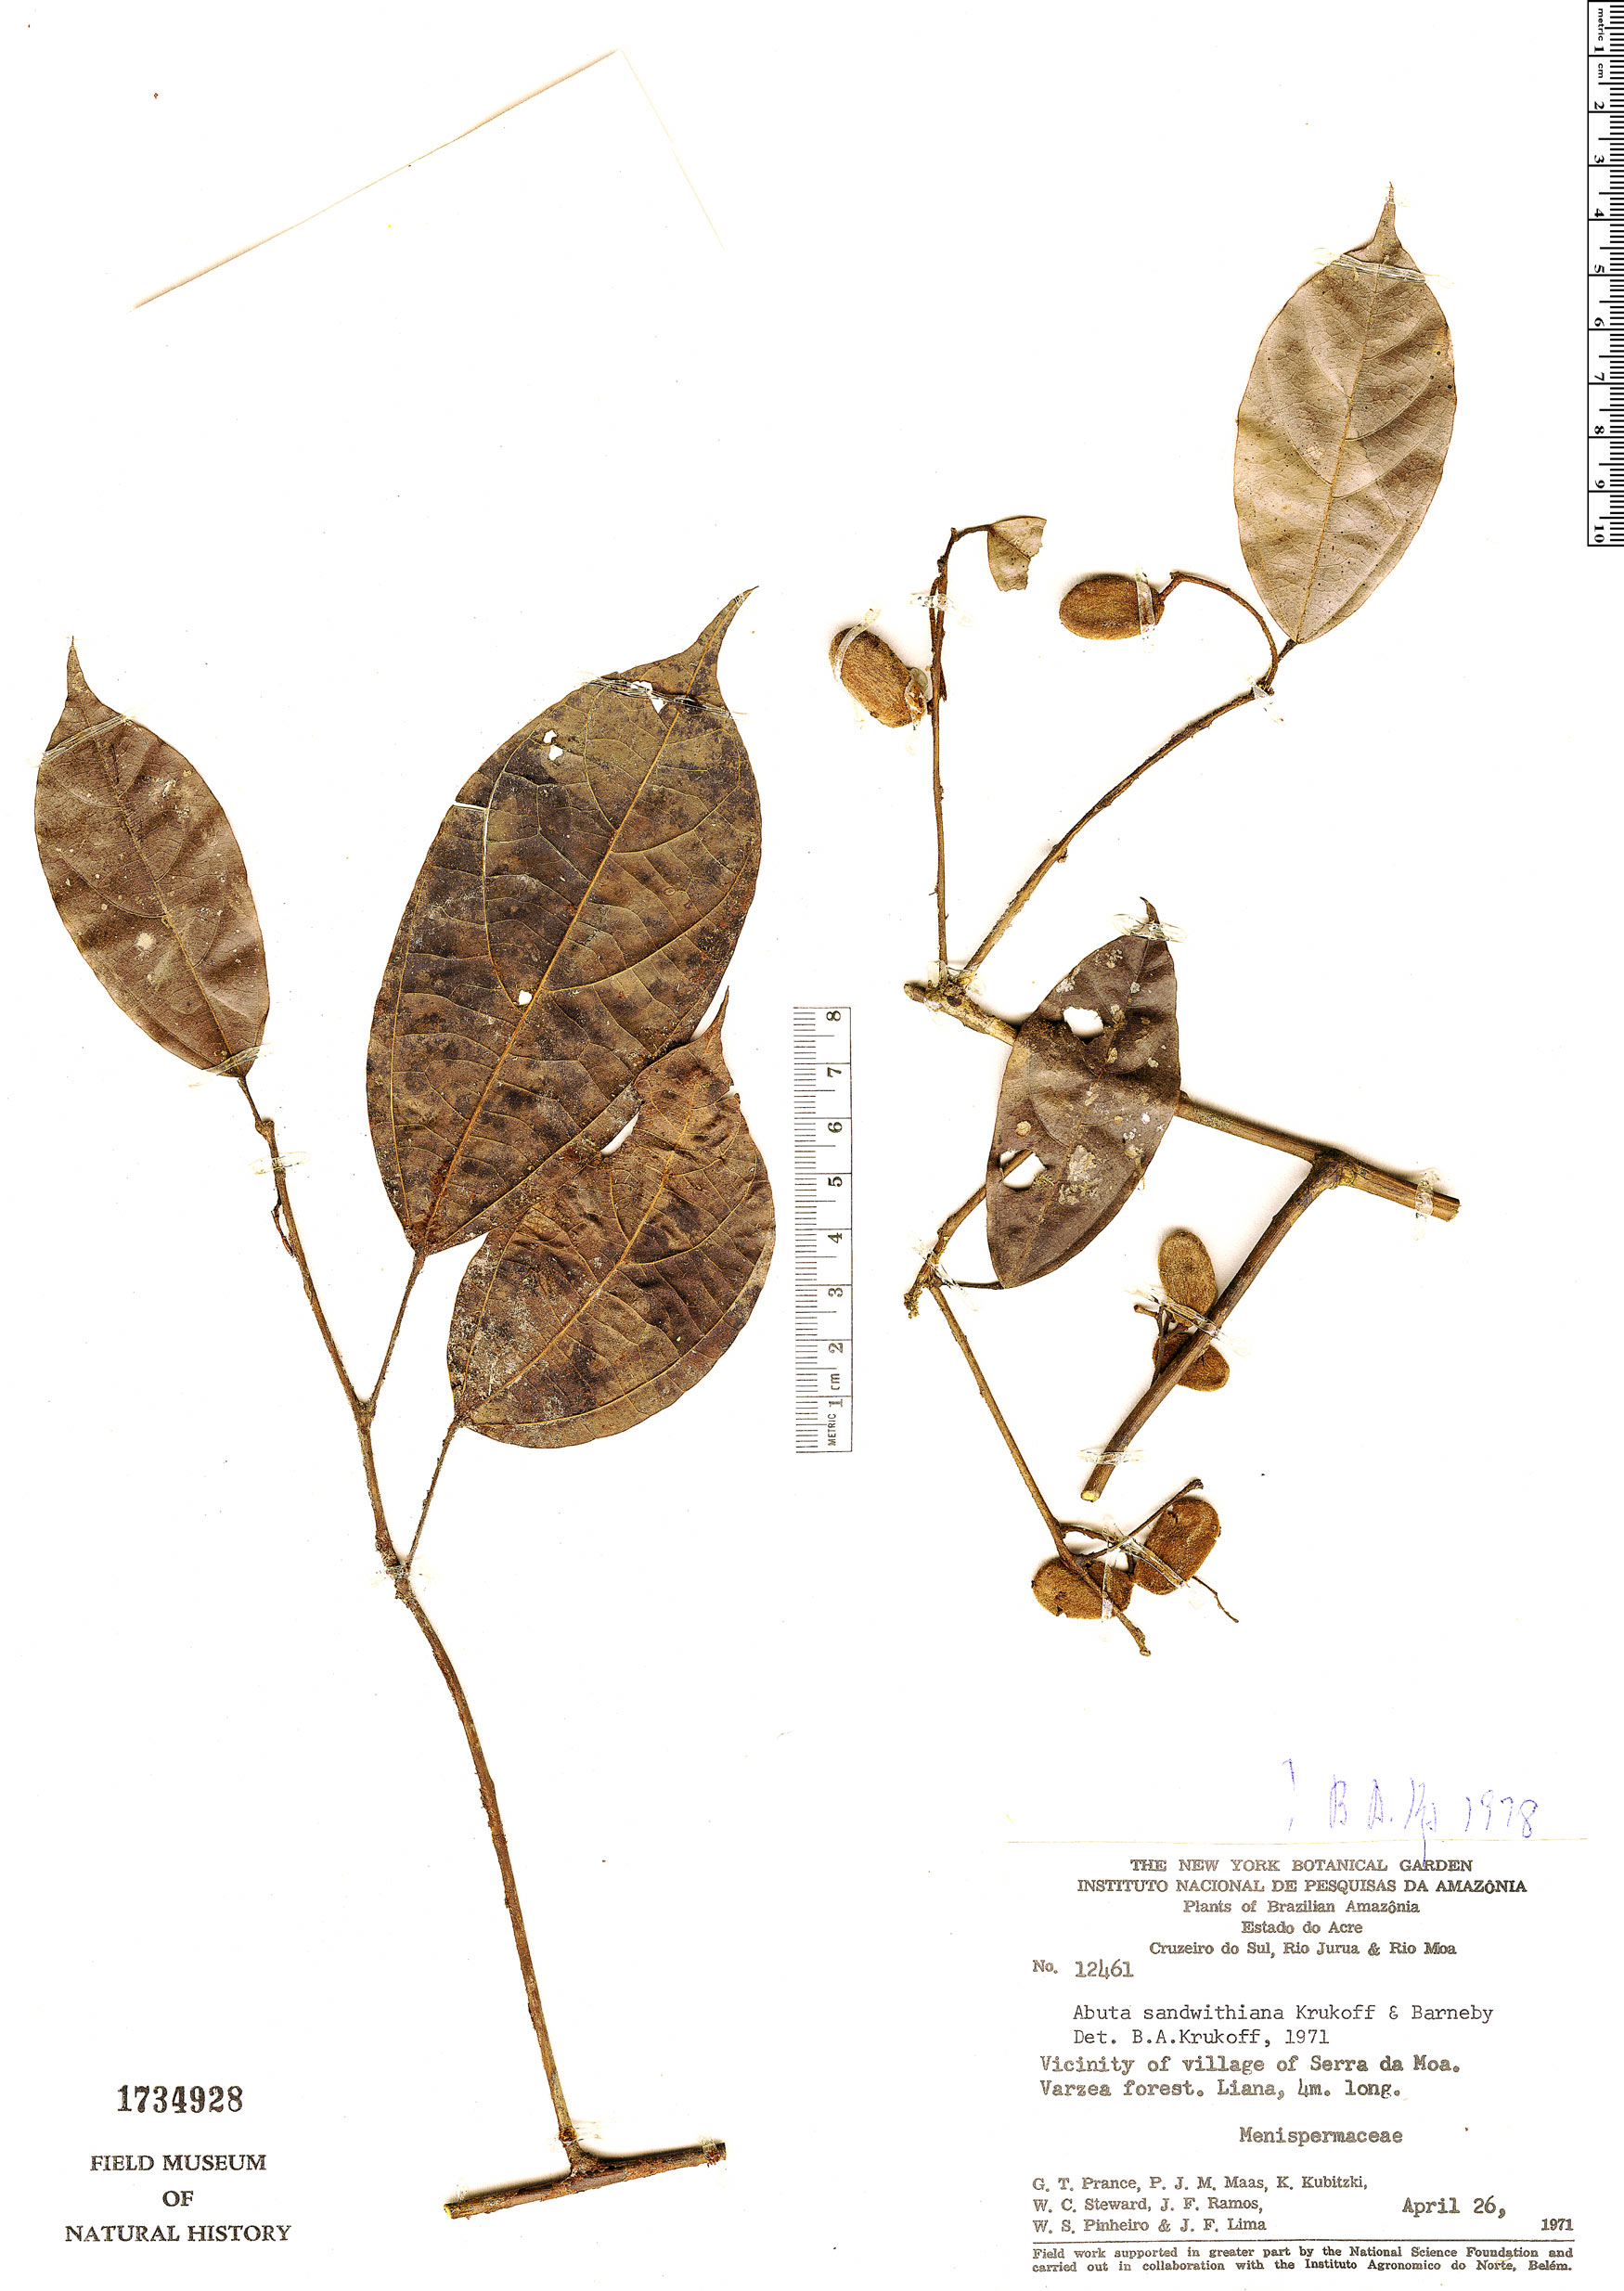 Espécime: Abuta sandwithiana